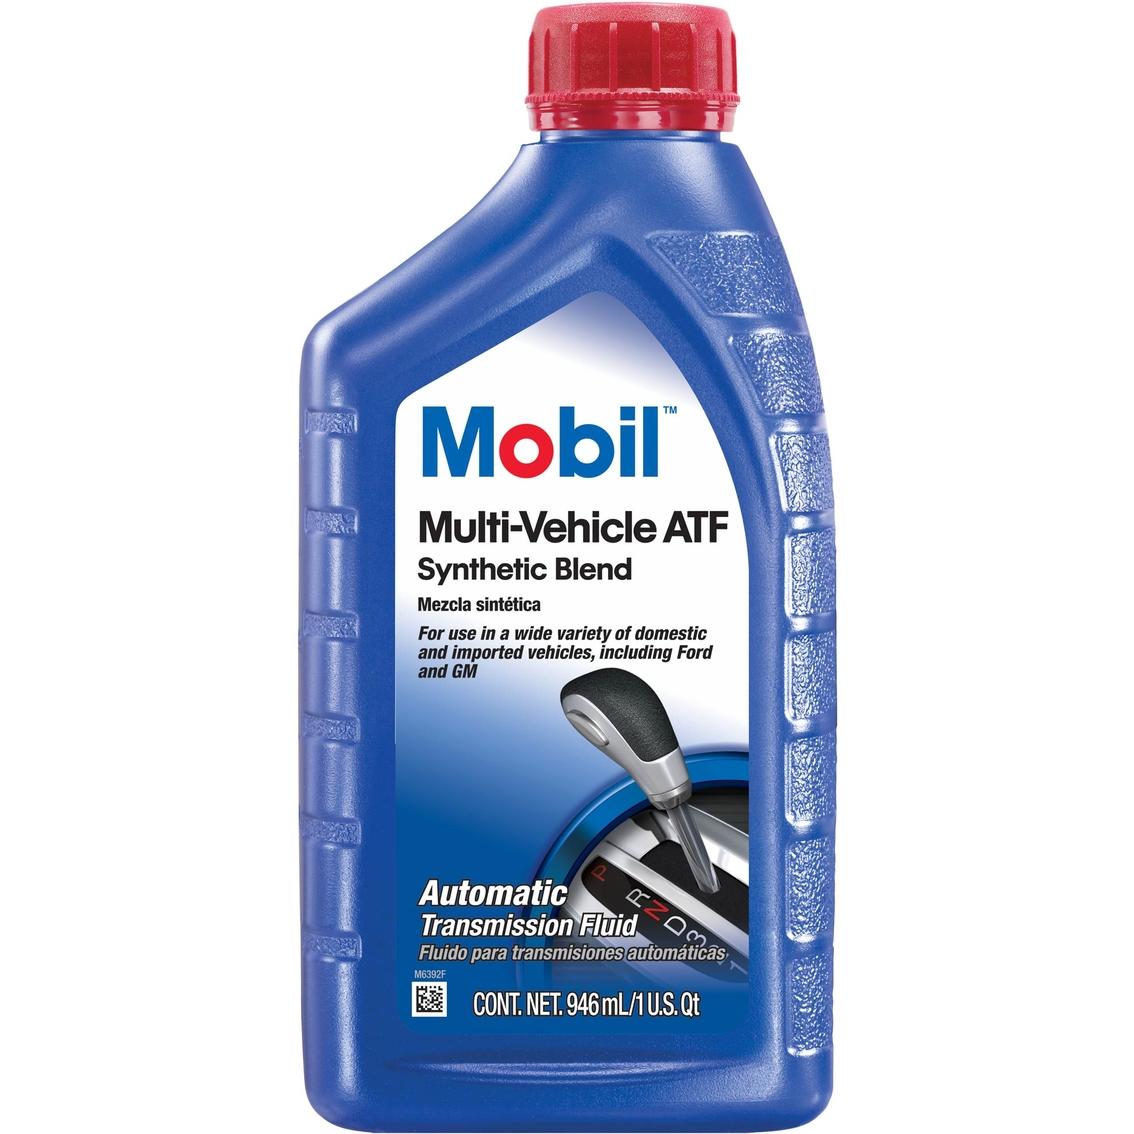 Mobilfluid Automatic Transmission Fluid : Mobil multi vehicle atf automatic transmission fluid qt